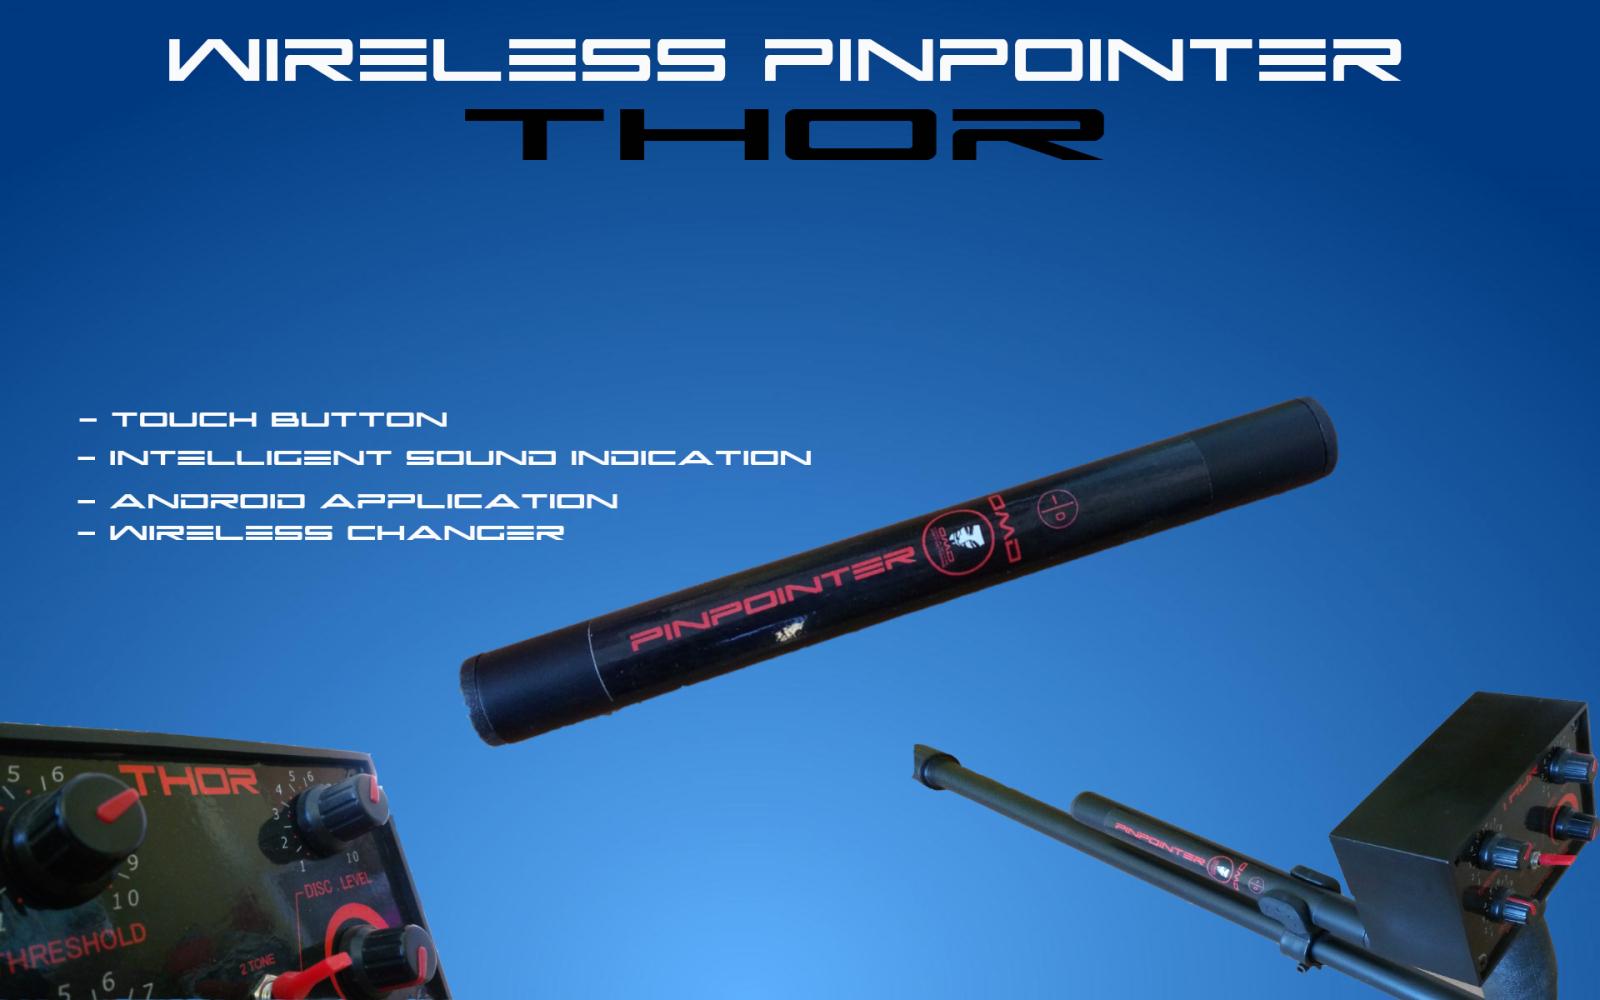 MD Pinpointer безжична връзка с металотърсач Thor